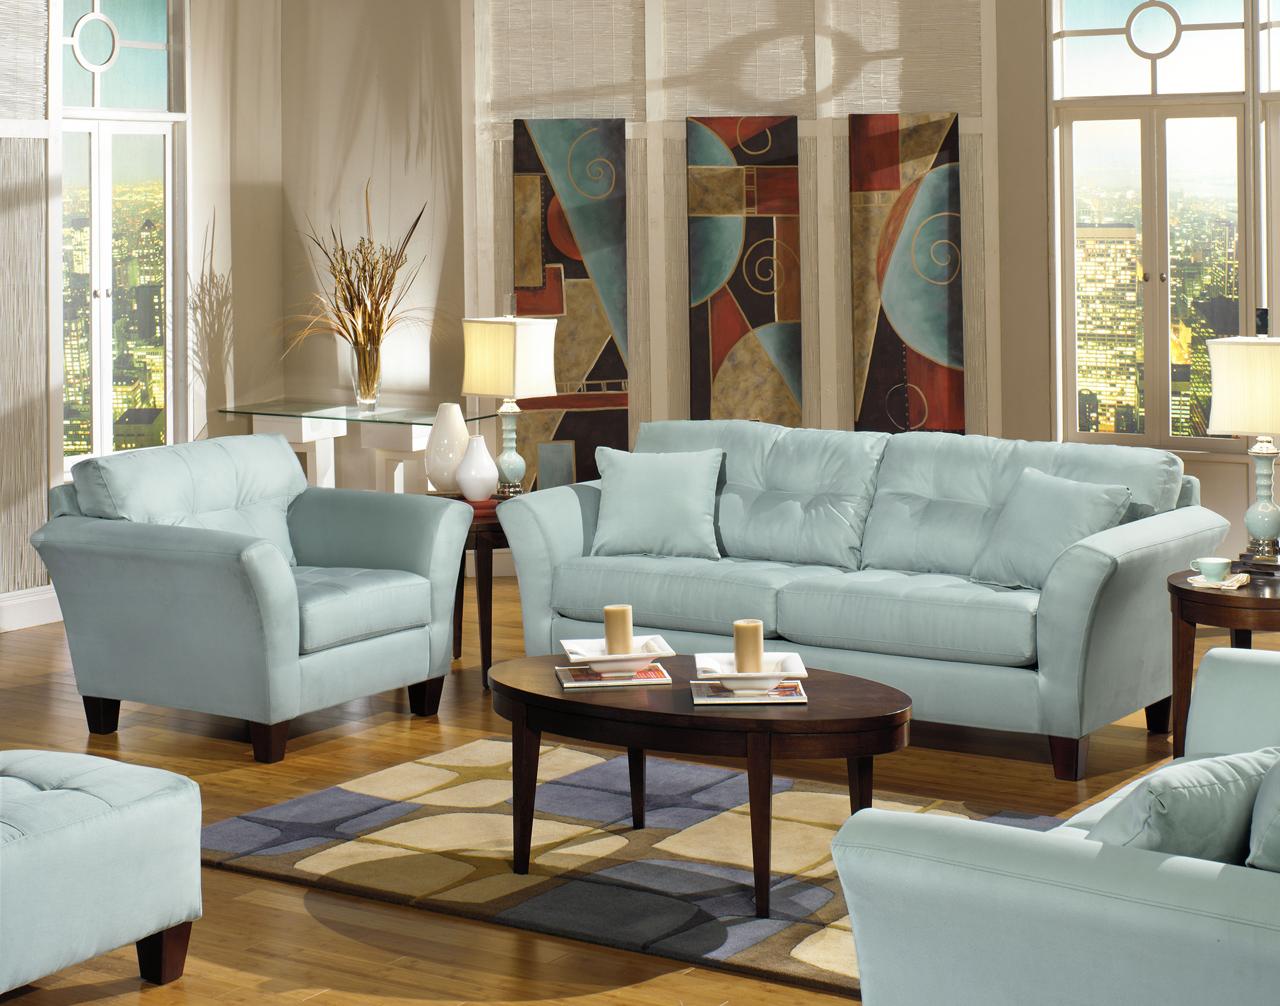 Light Blue Couch : Furniture > Living Room Furniture > Sofa > Riviera Sofa